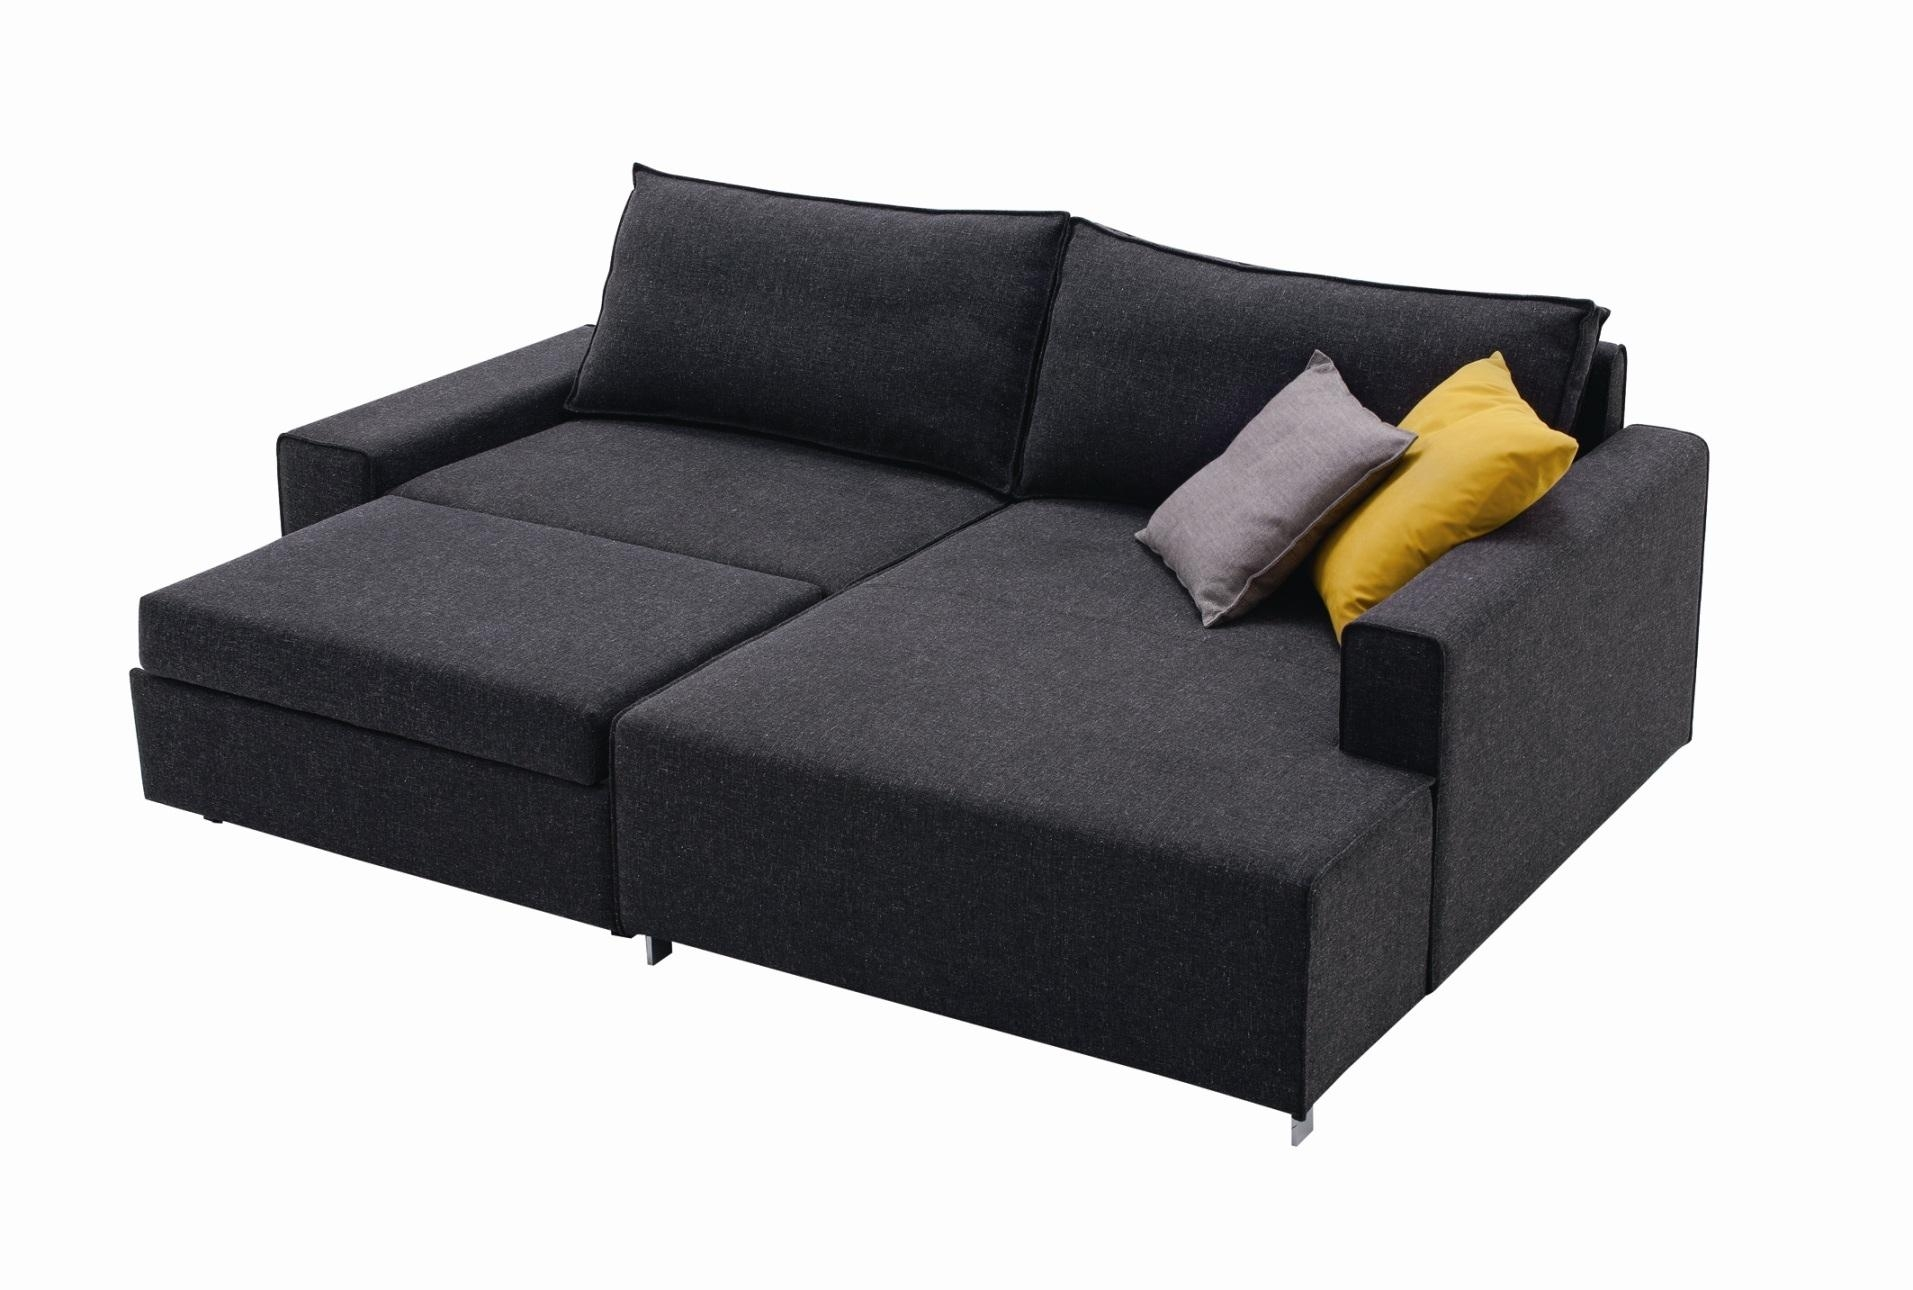 Furniture: Ikea Sectional | Ikea Futon | Ikea Sofa Sleeper With Regard To Mini Sofa Beds (View 12 of 20)